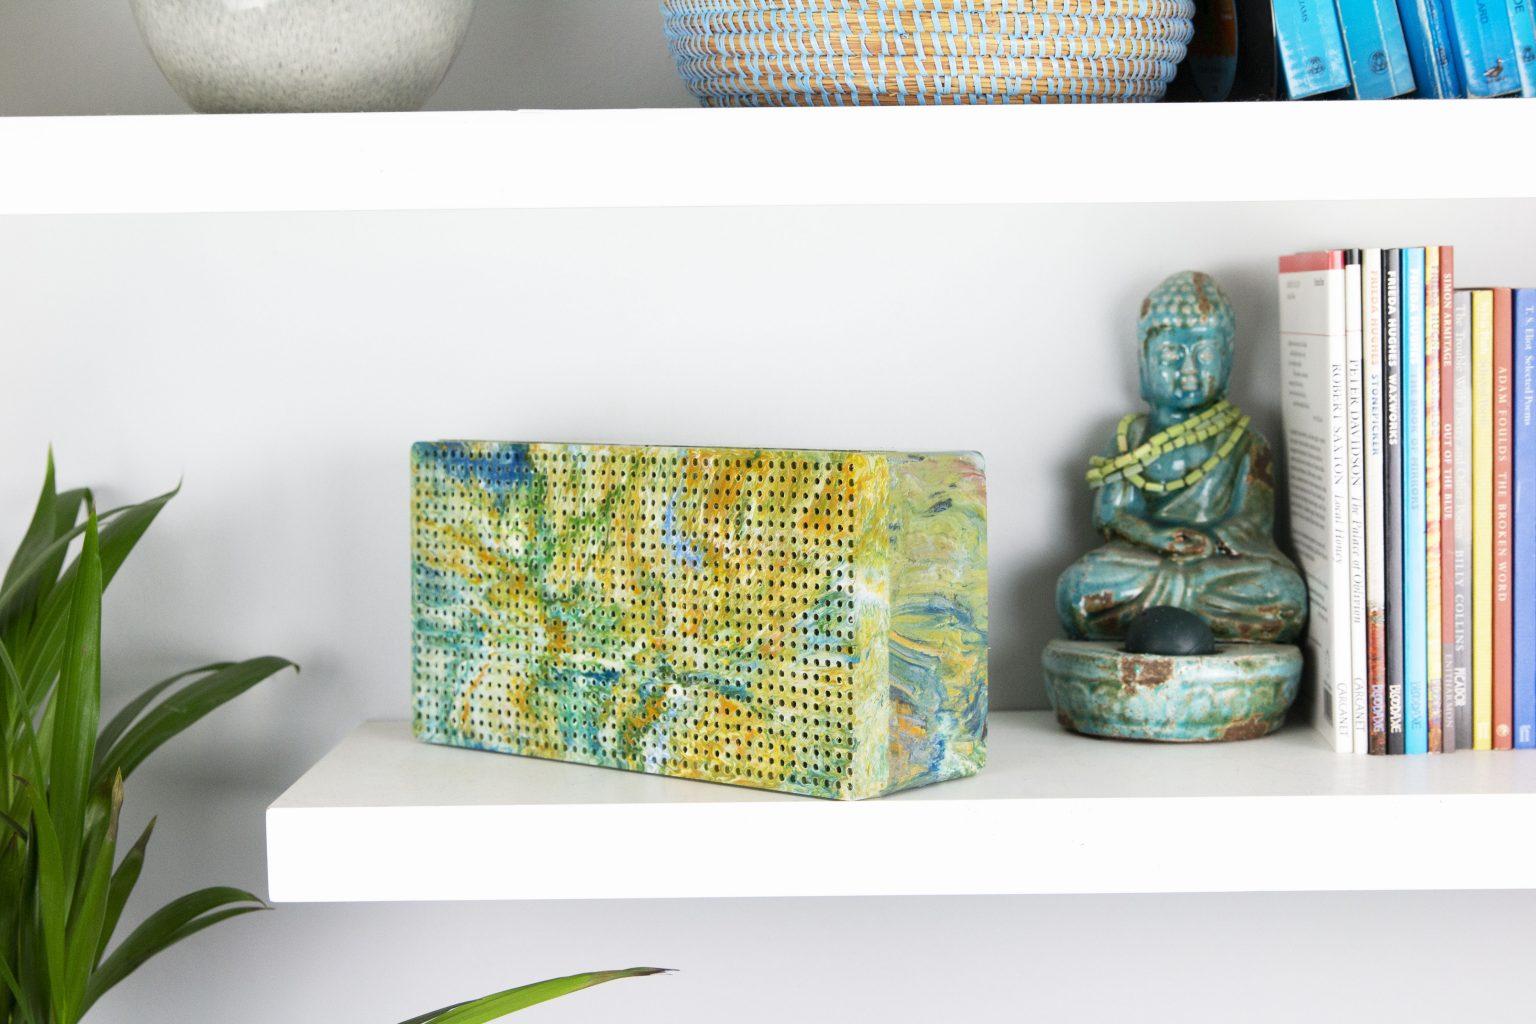 Image: Gomi Designs speaker in bright multicolors on a bookshelf